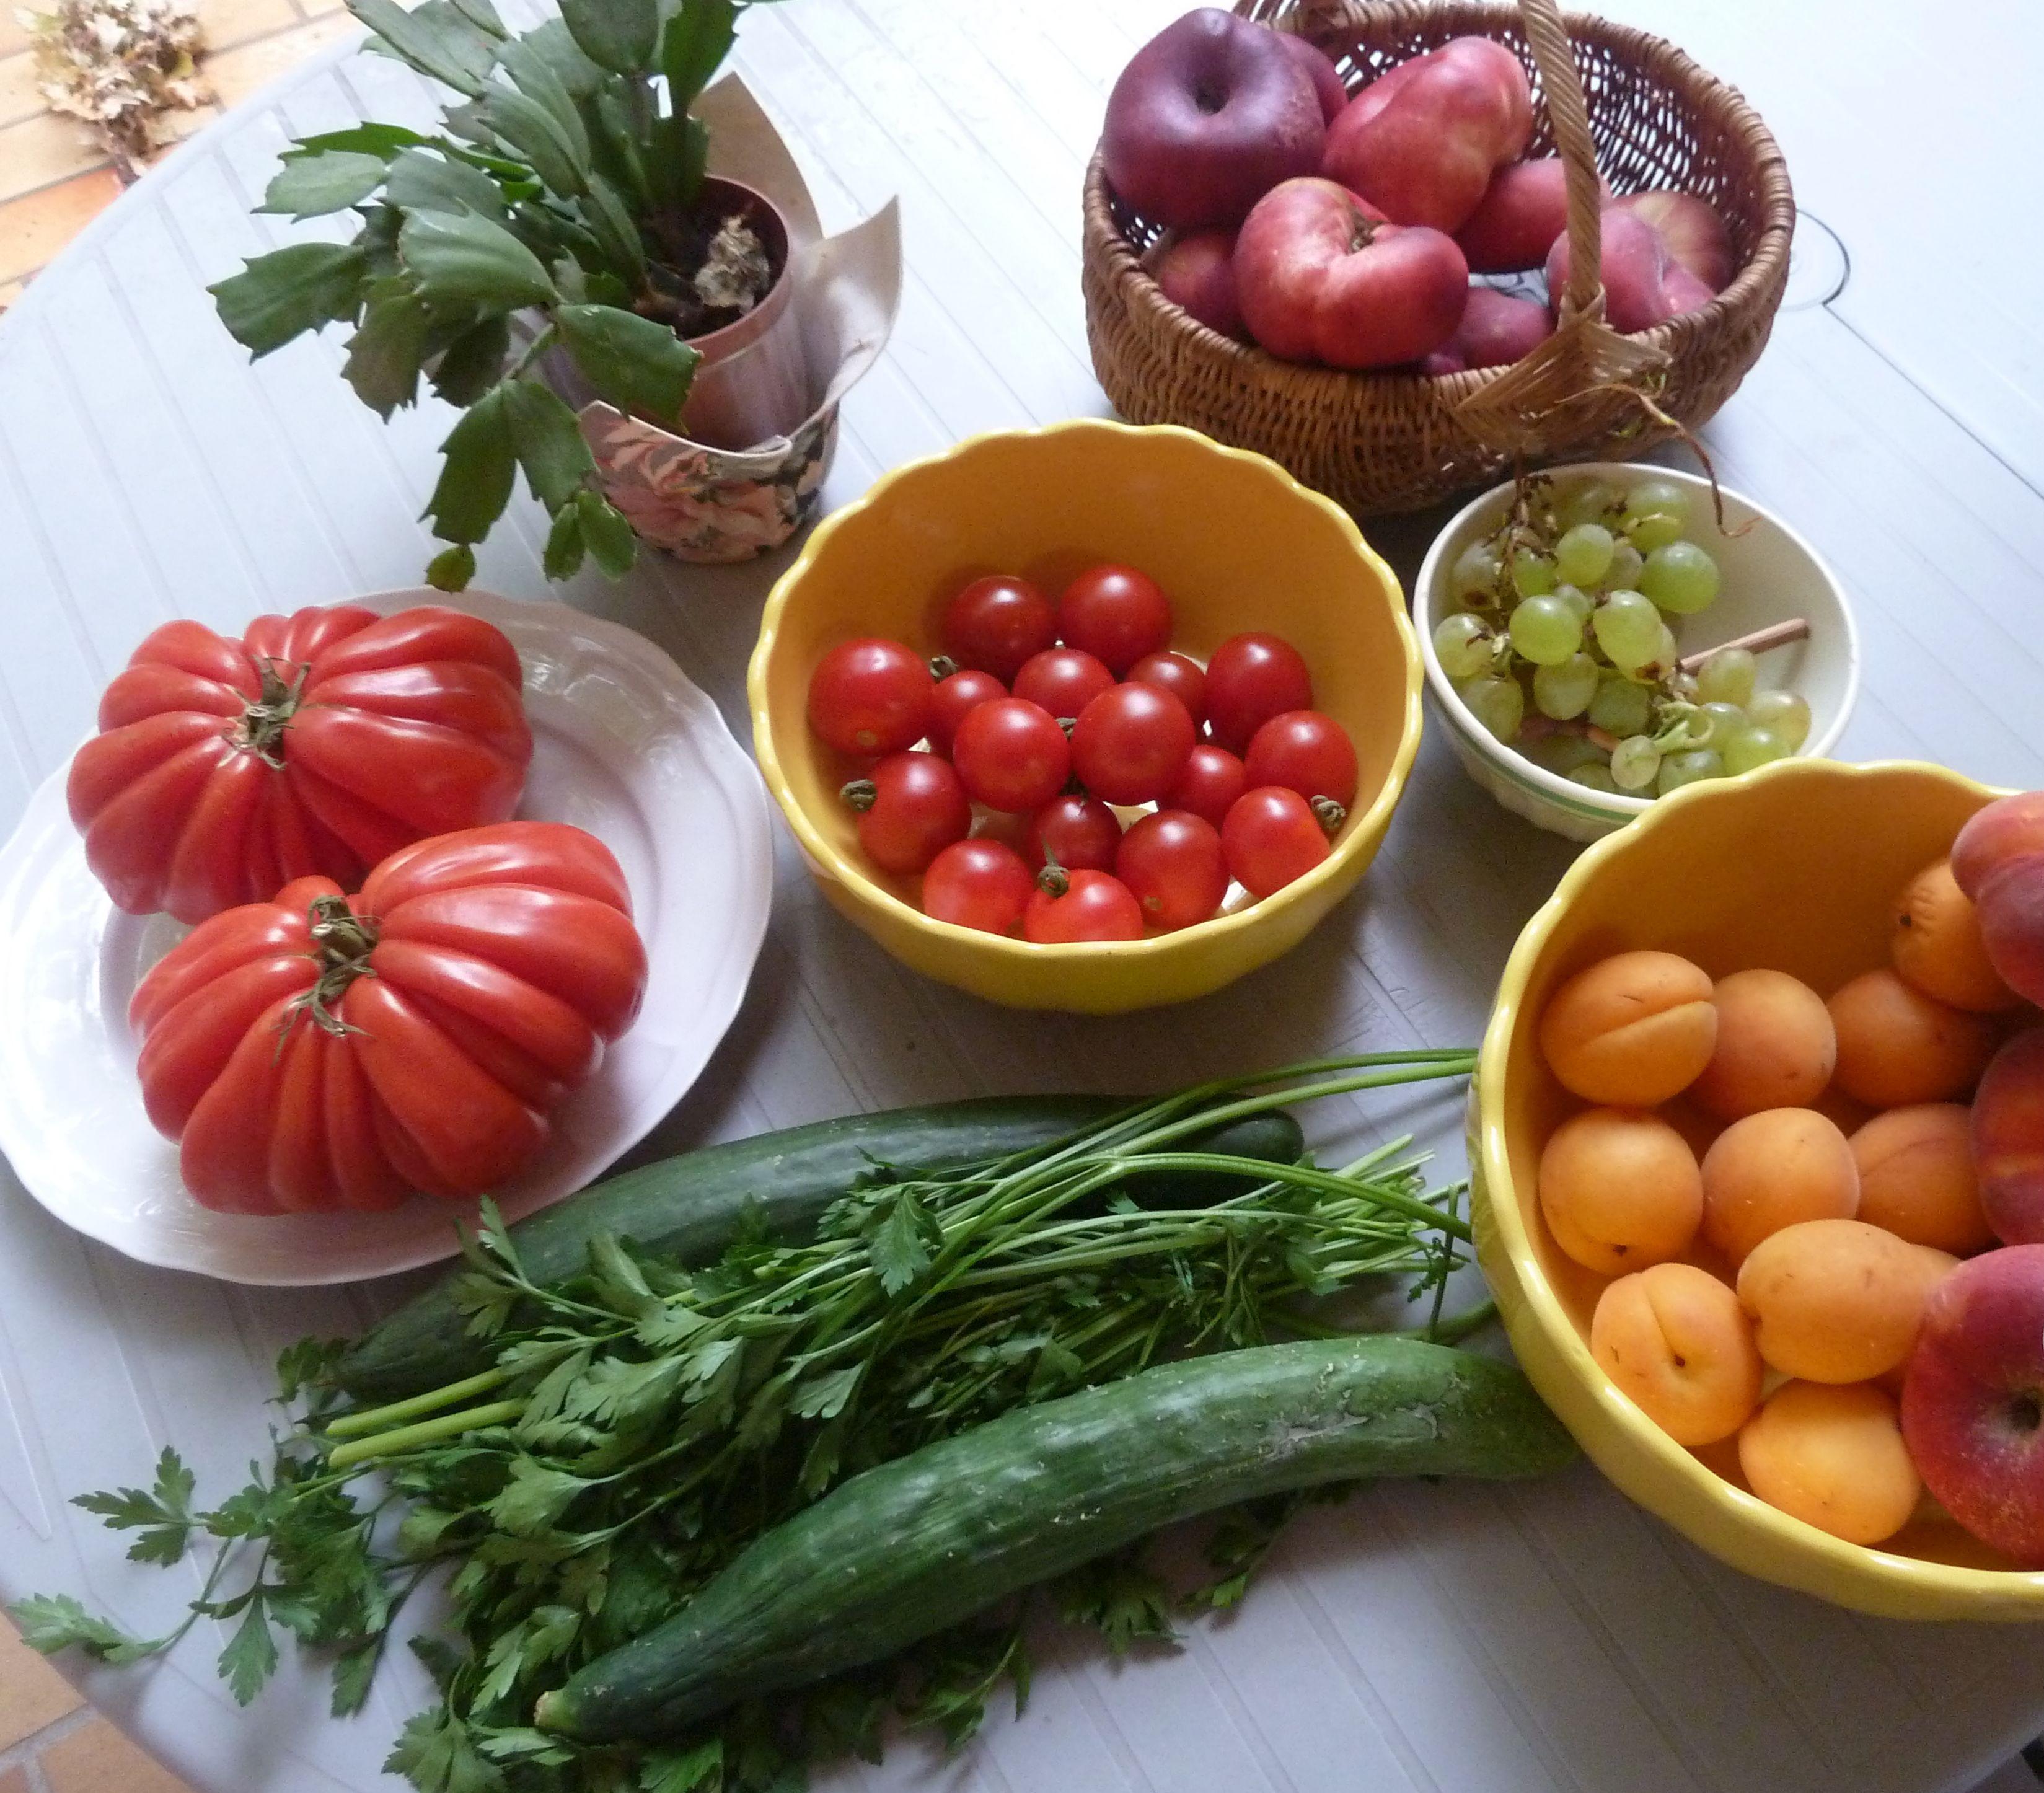 fruit-vegetables-on-table